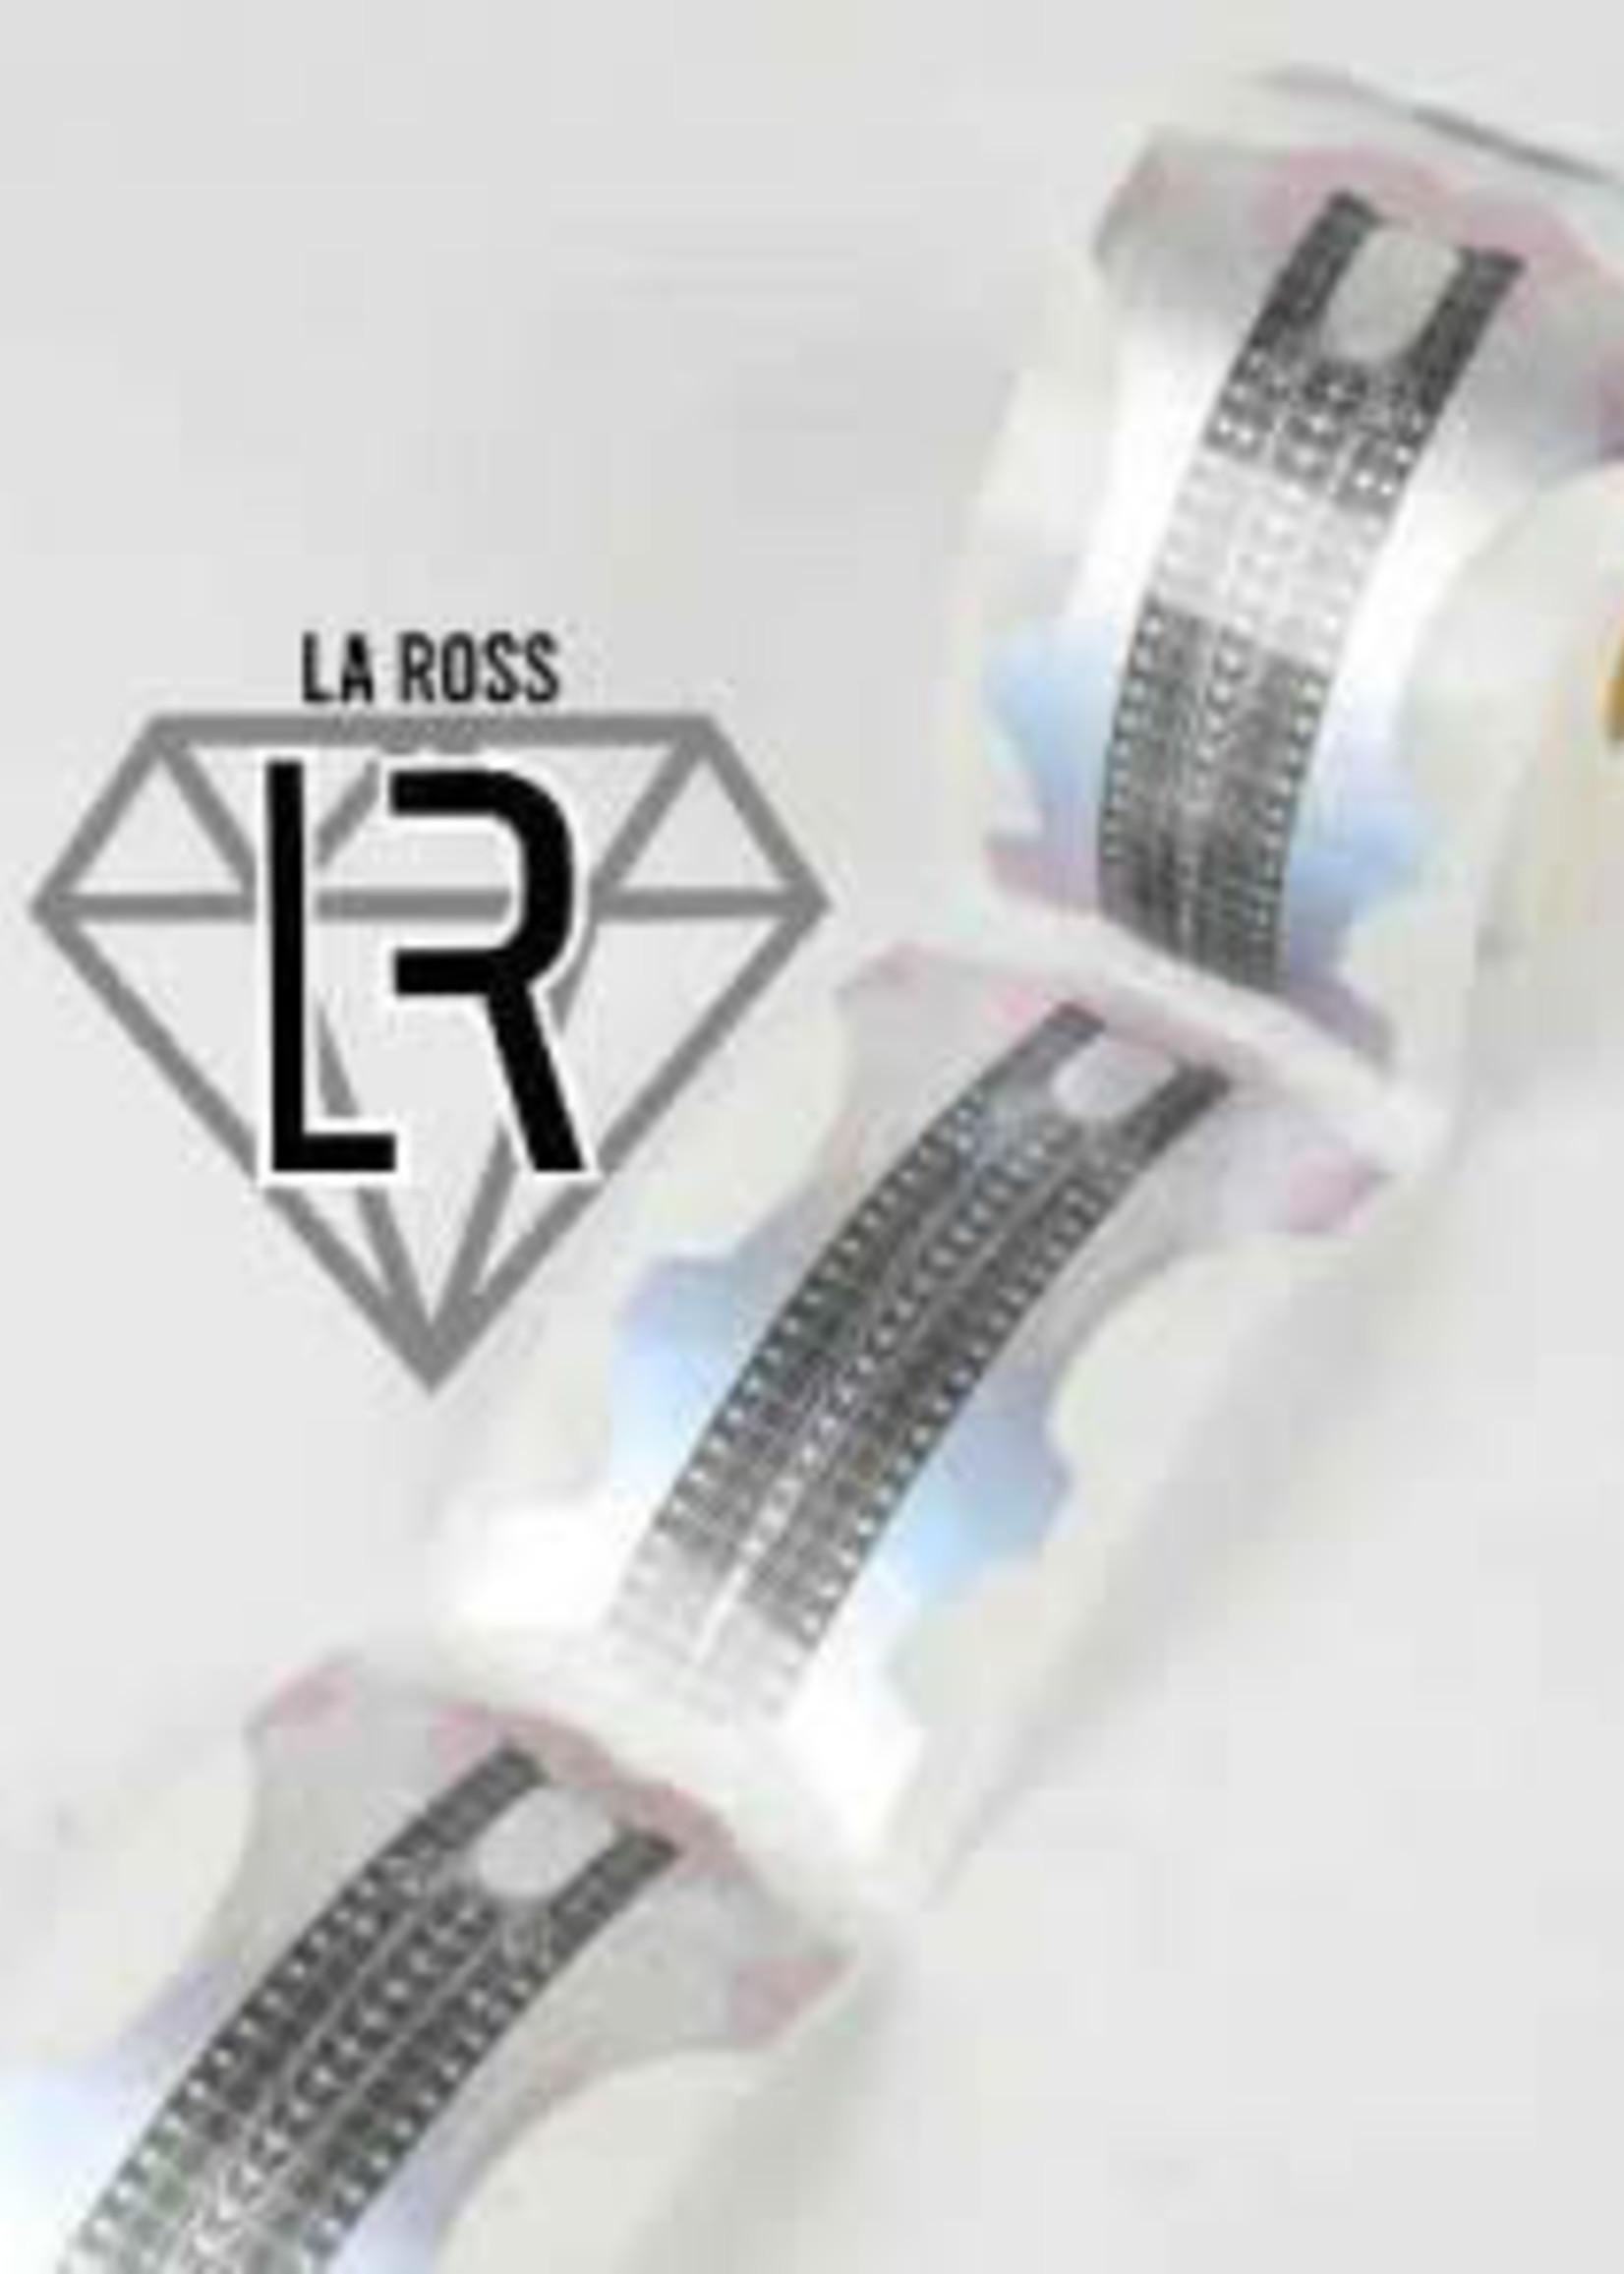 La Ross XXL Nailforms